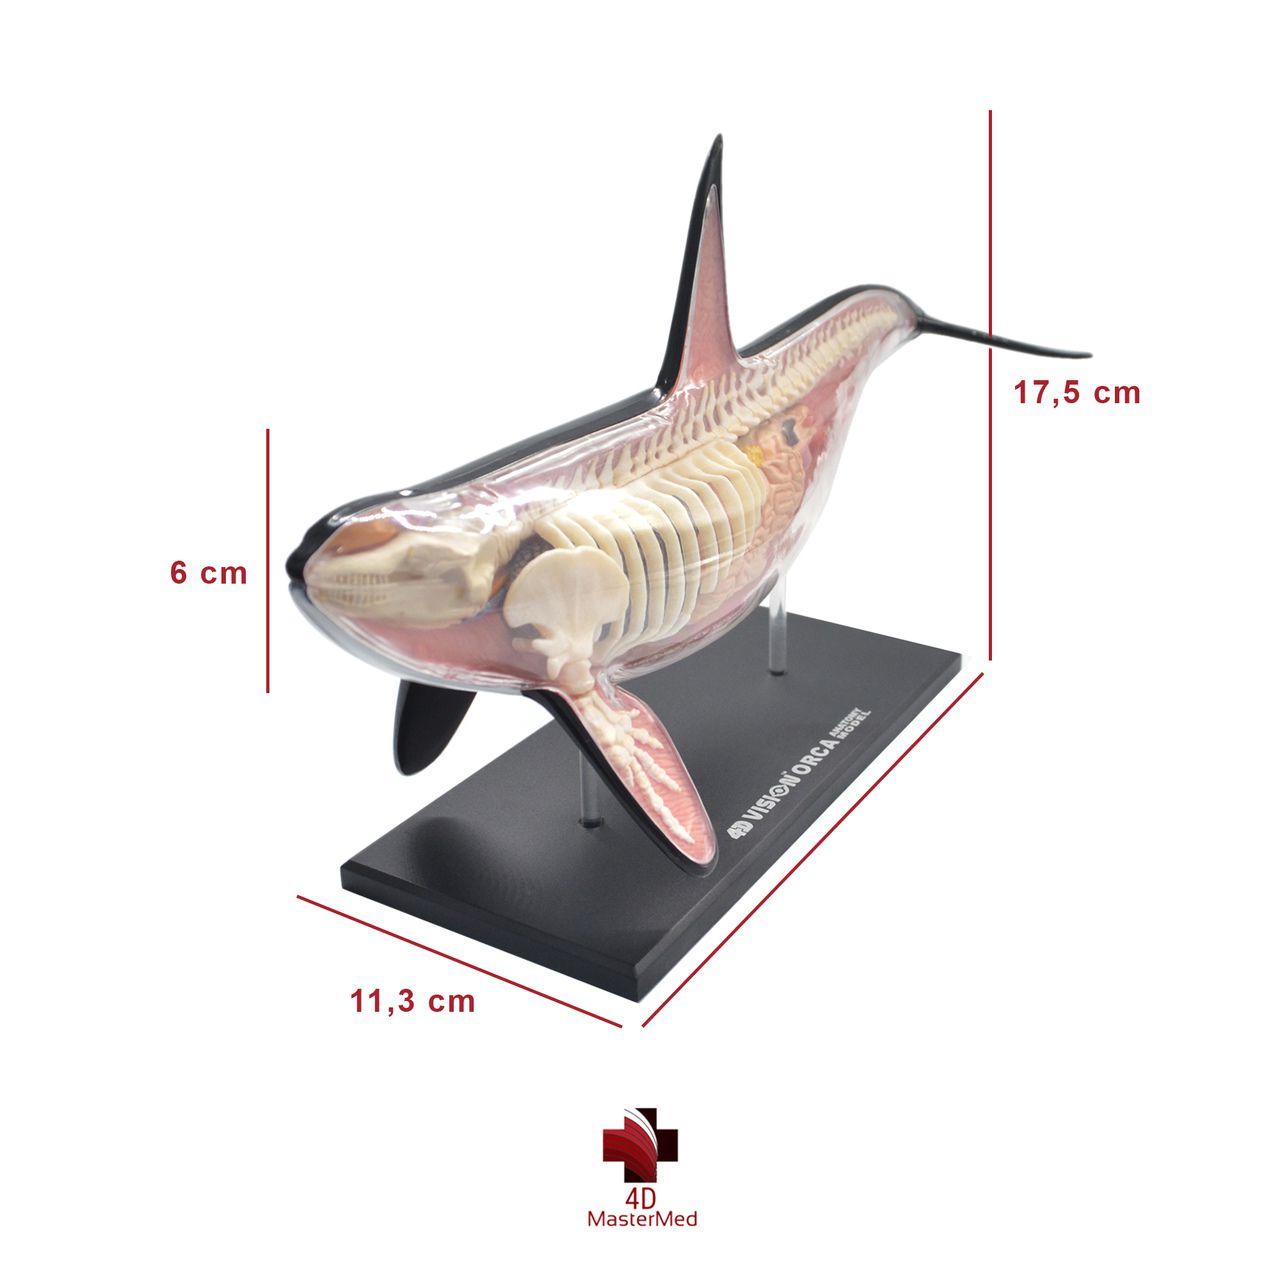 Anatomia da Orca